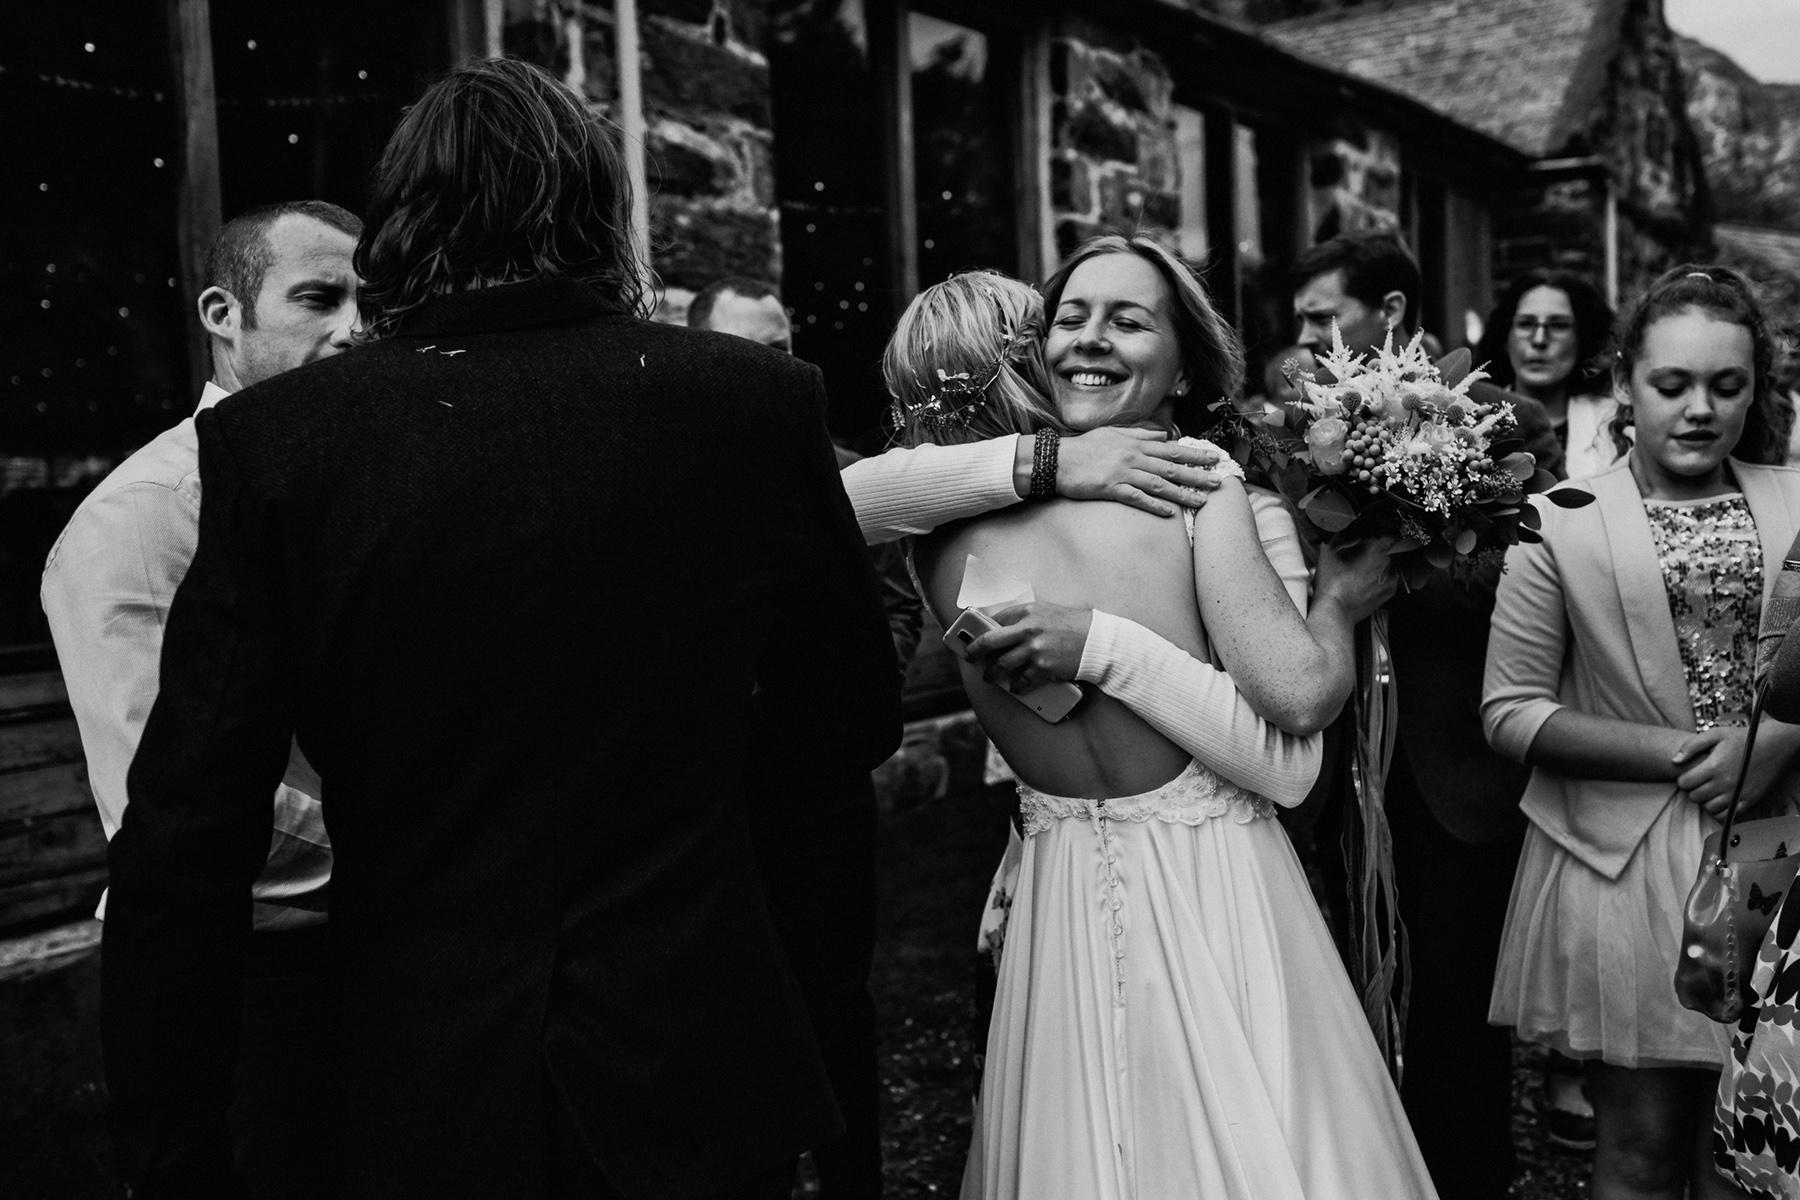 Snowdonia-Wales-Wedding-Photos-0341.jpg